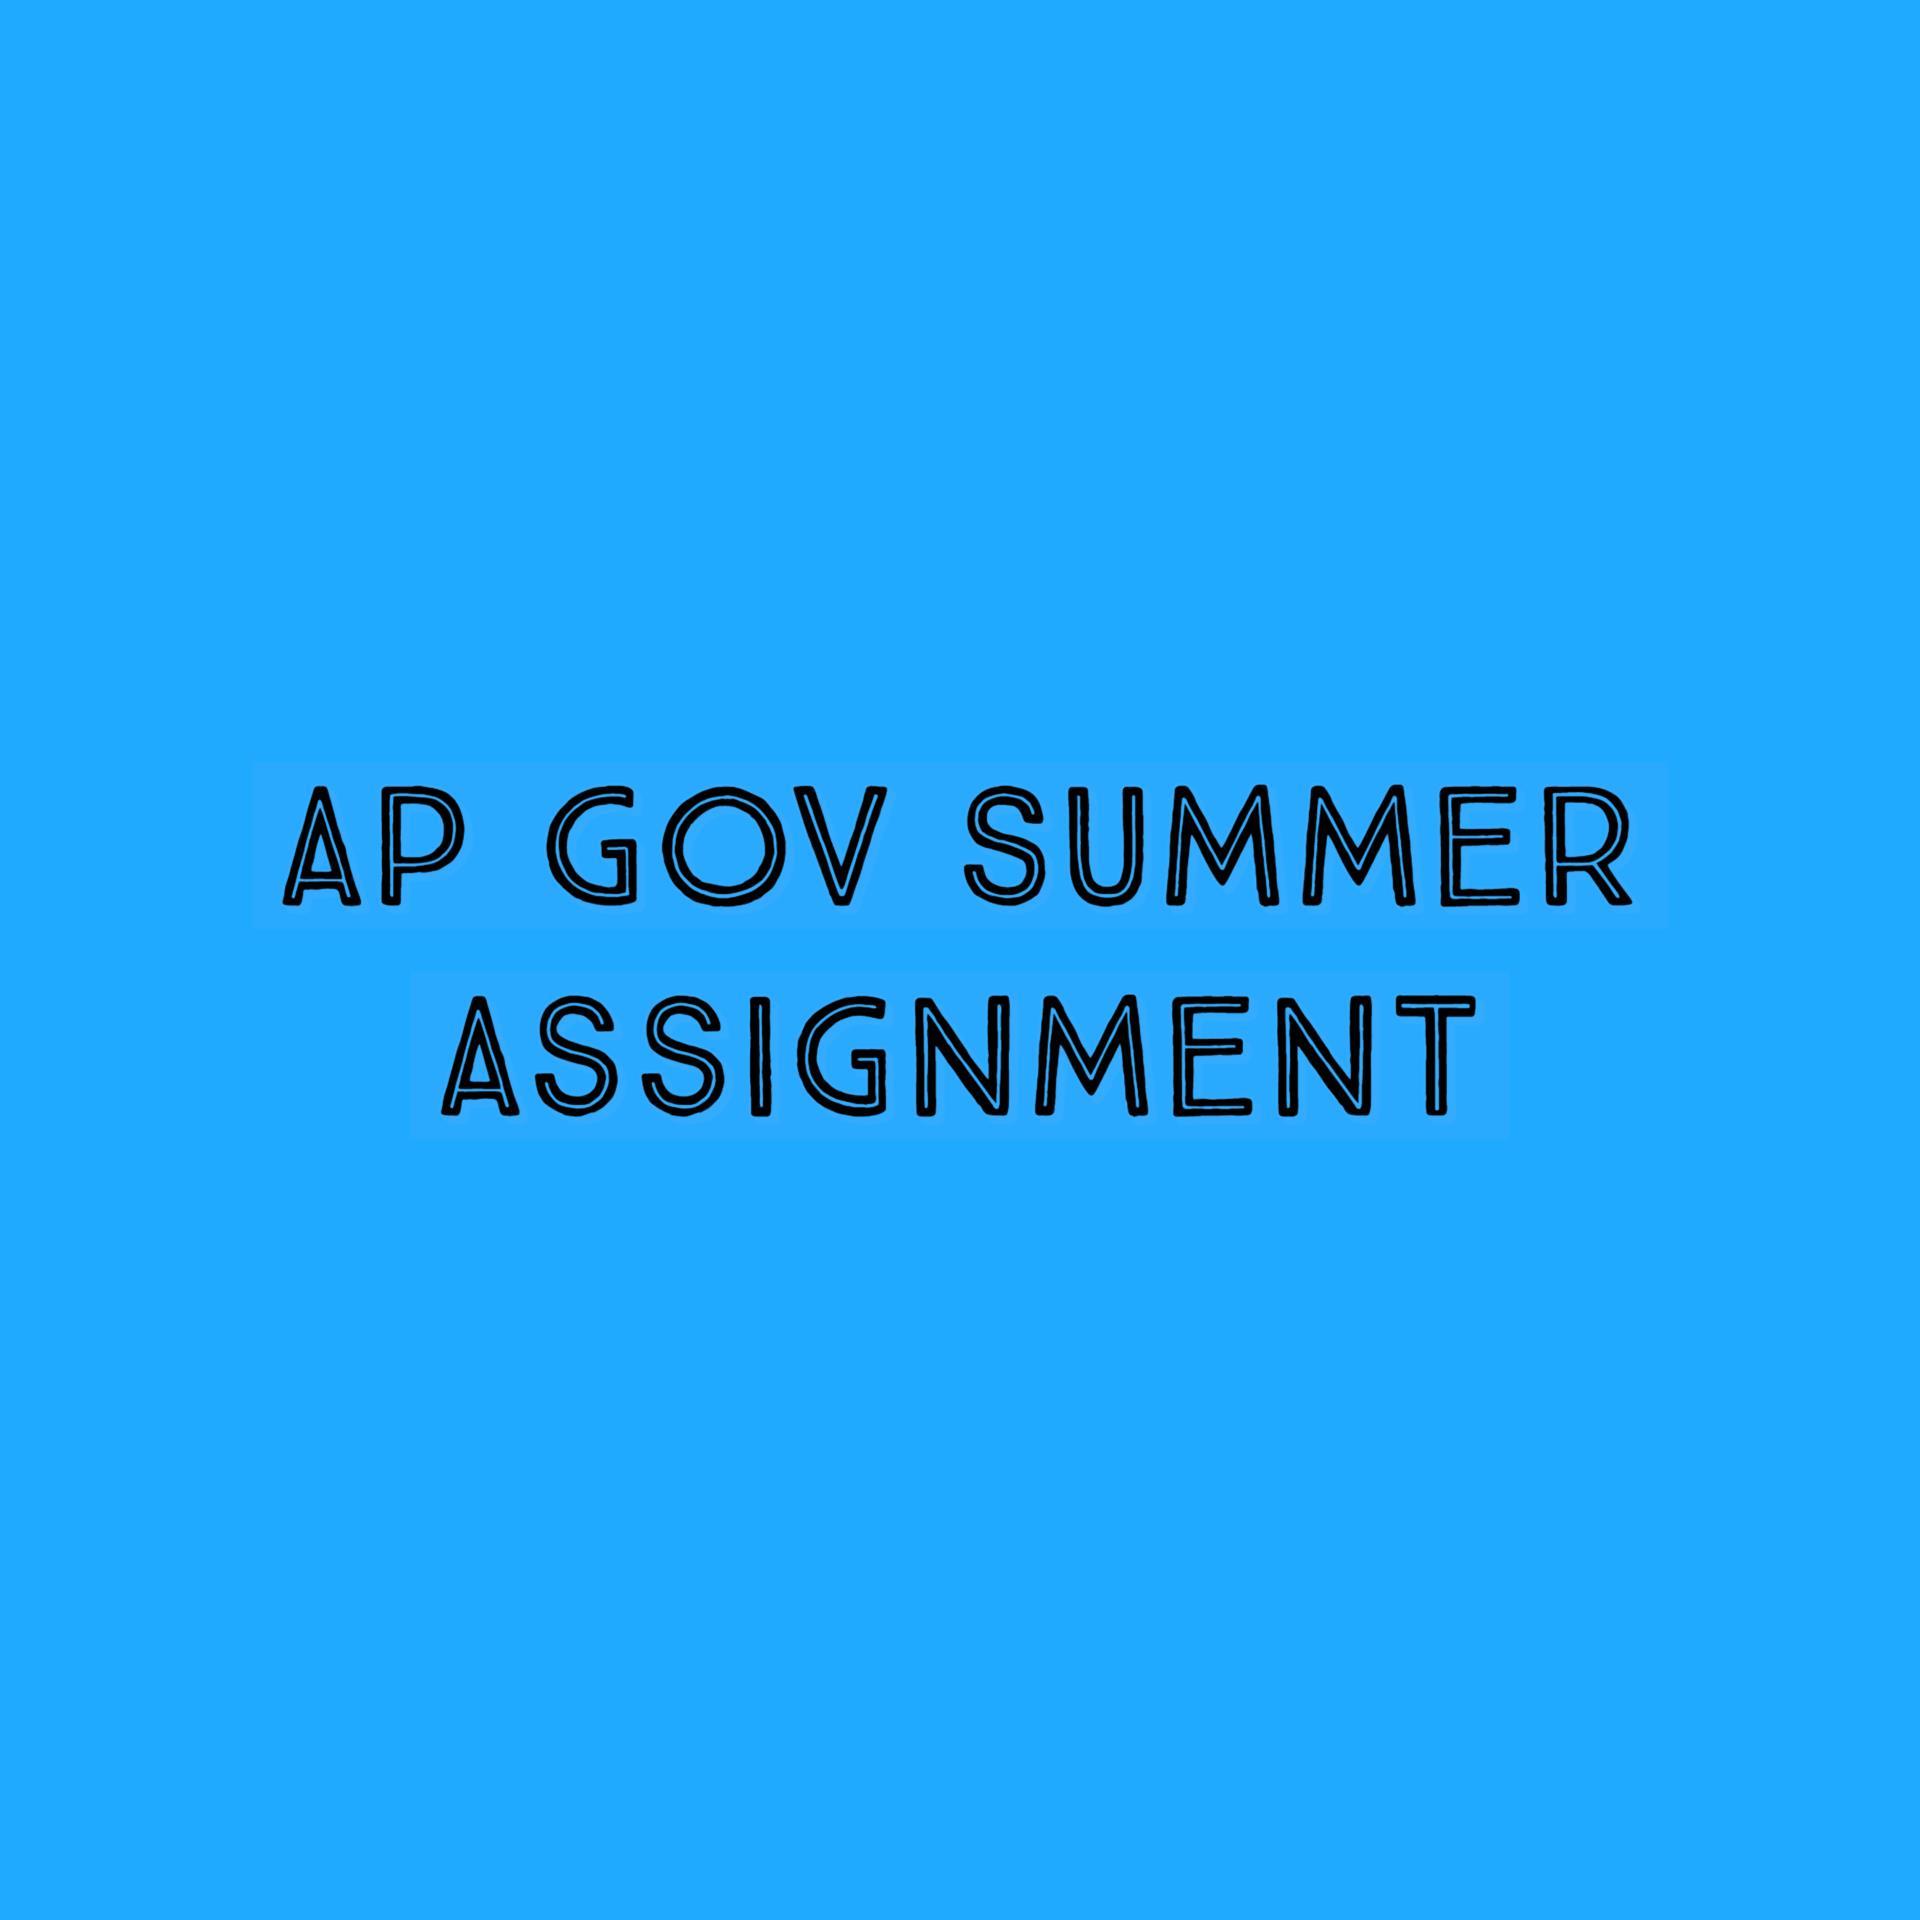 AP GOV SUMMER